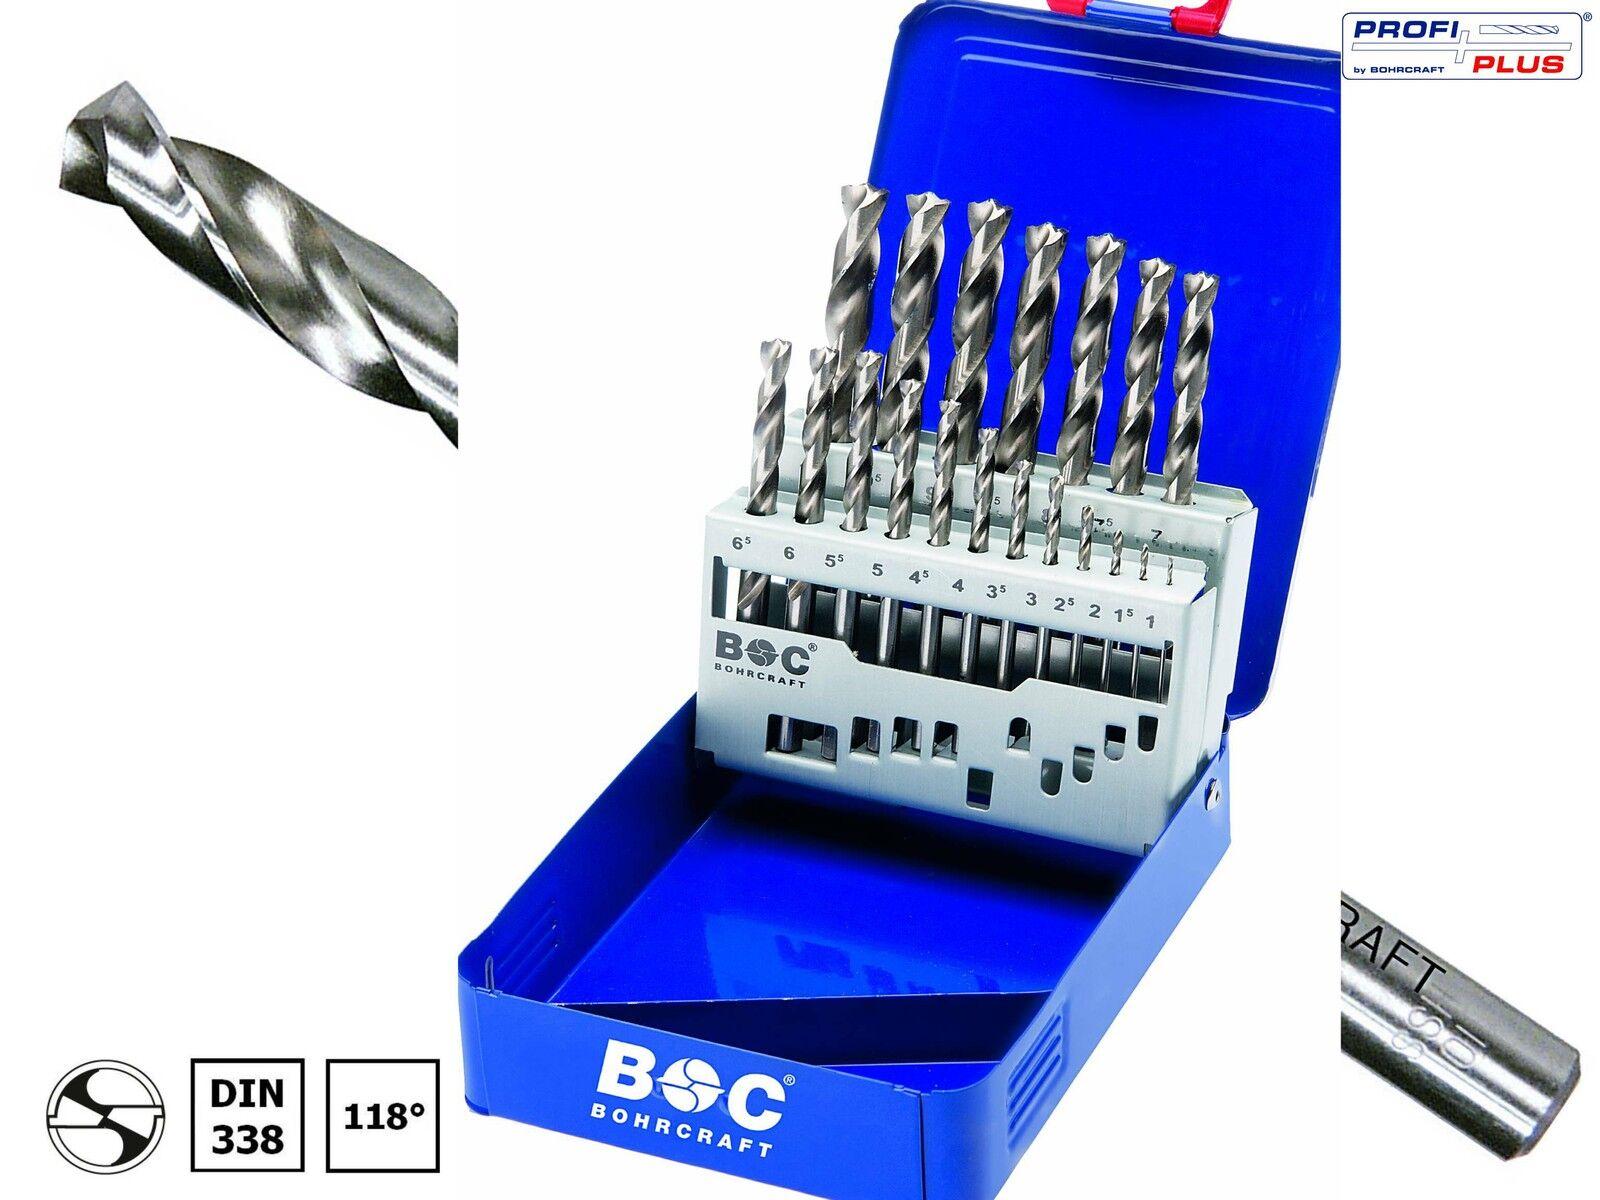 BOHRCRAFT 25-tlg HSS-G Präzisions-Spiralbohrer DIN338 1,0-13,0 x 0,5mm Metall